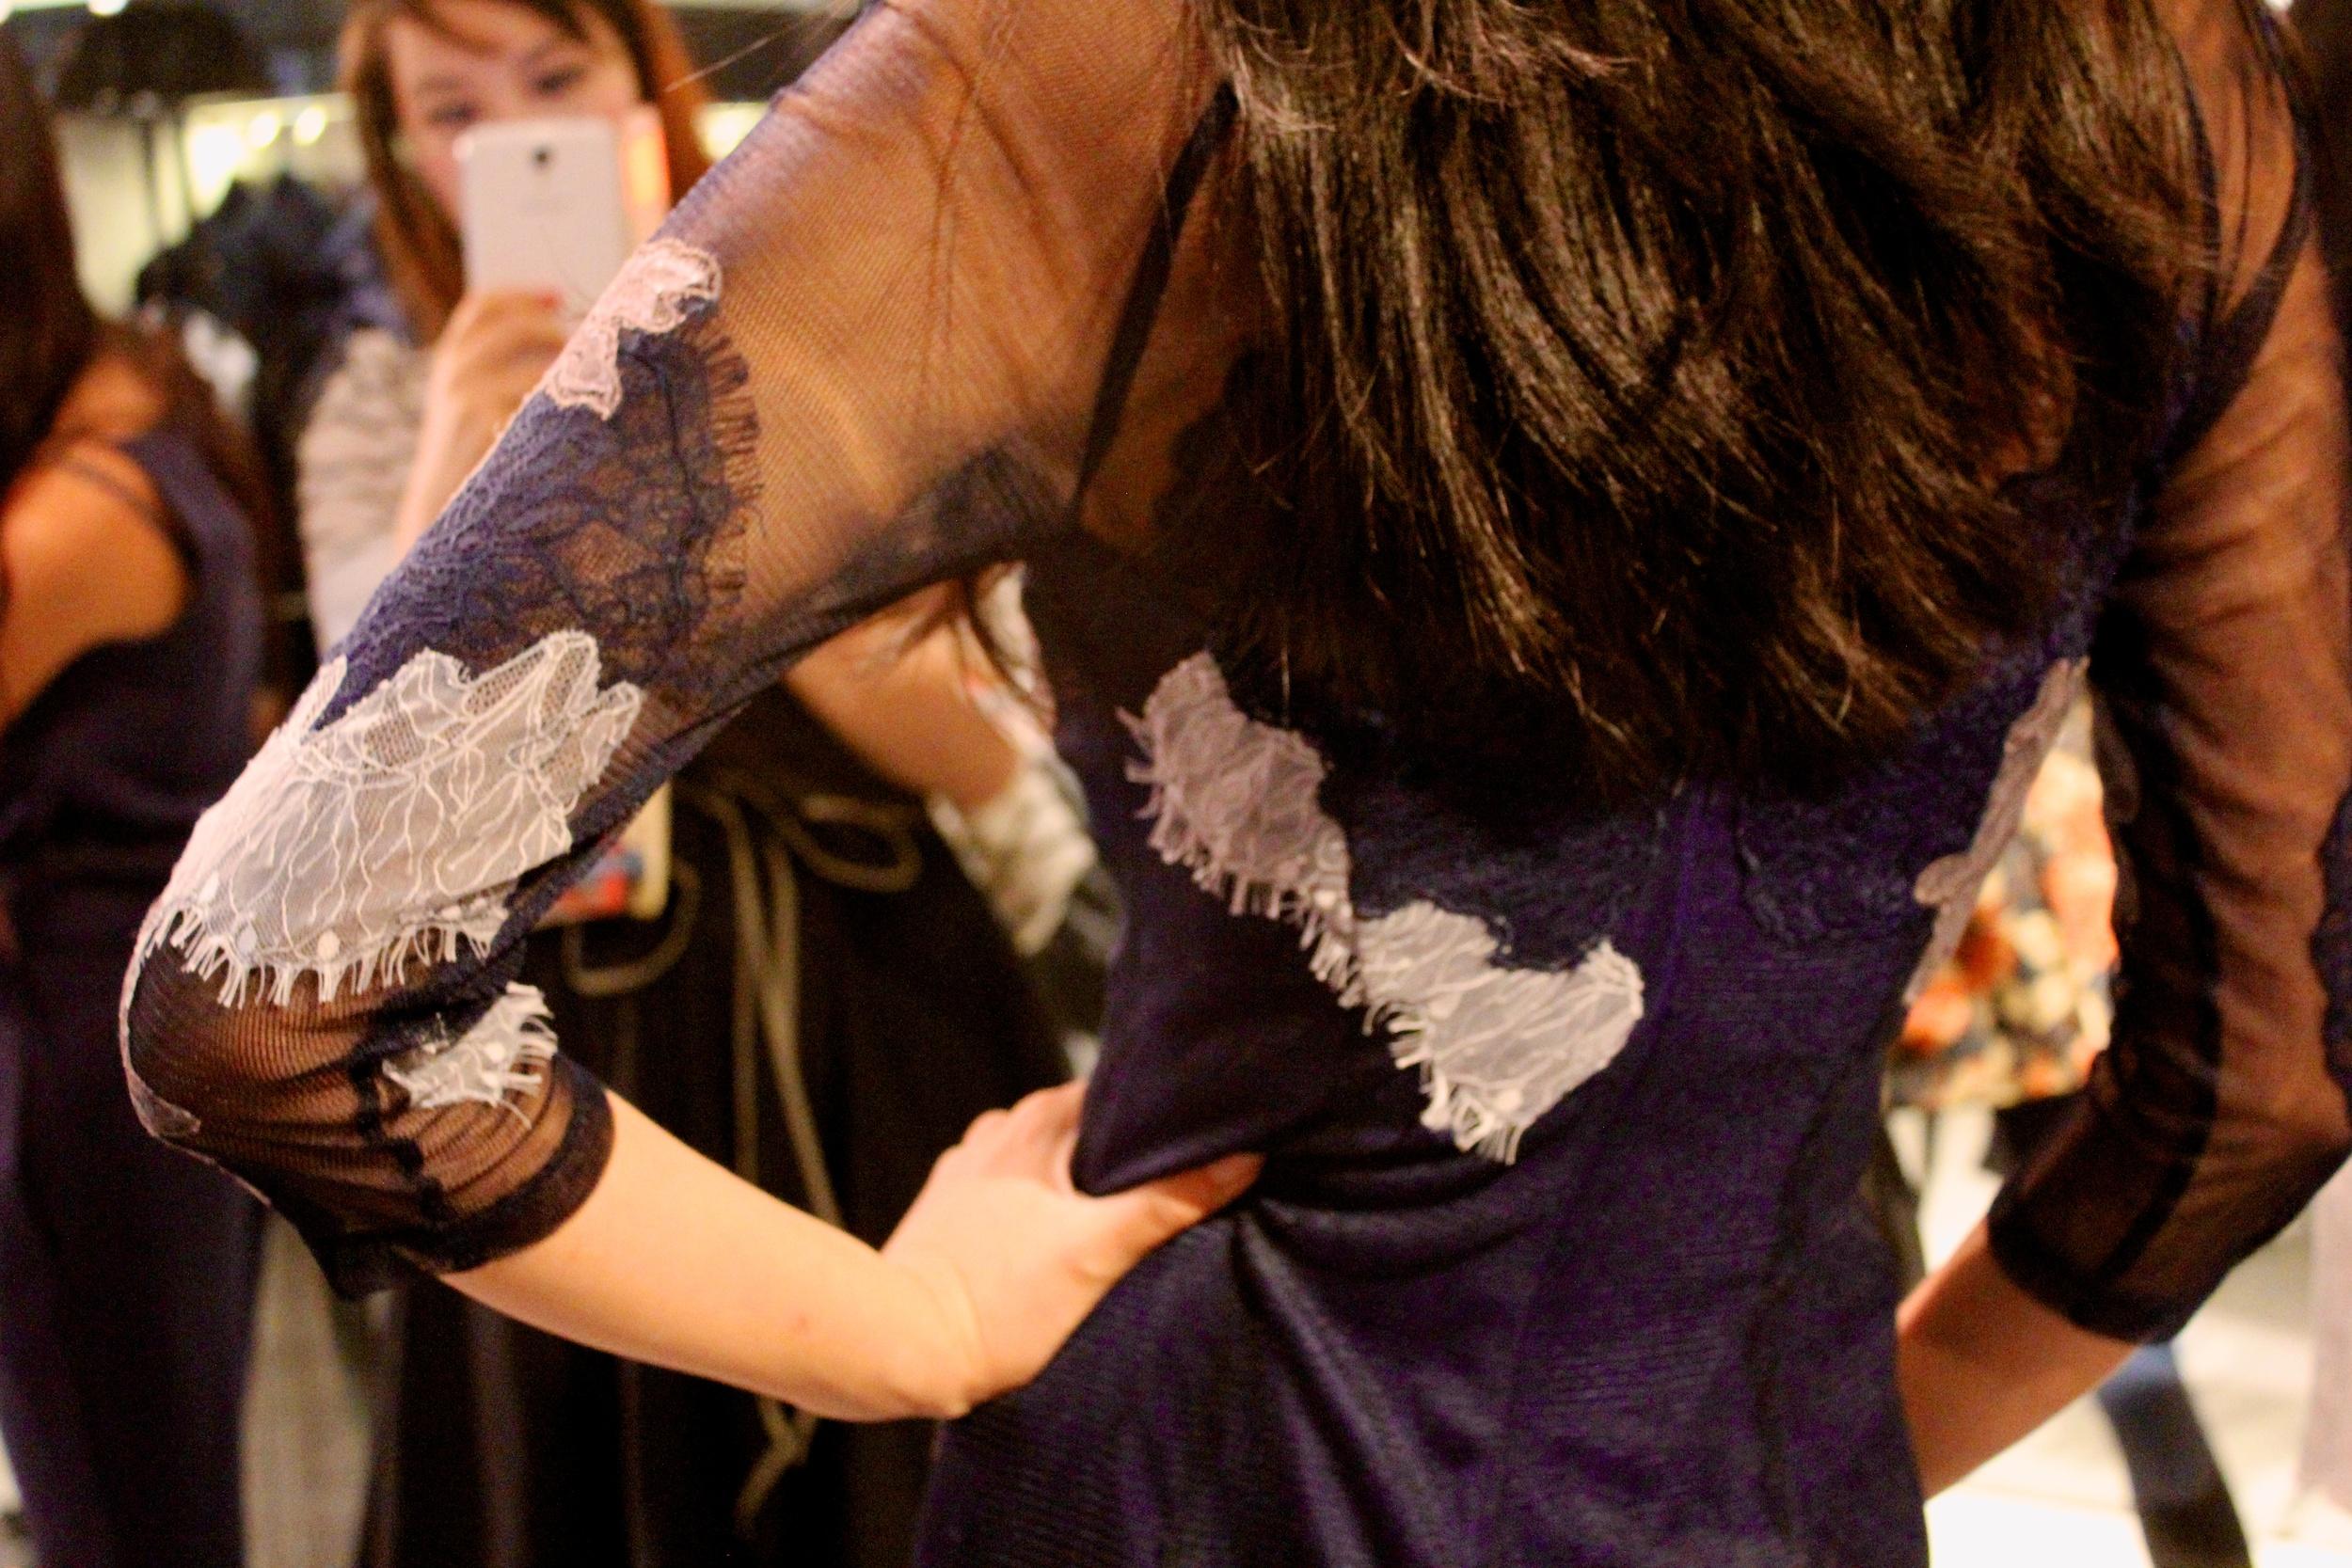 Dress:  Lace embroidery dress